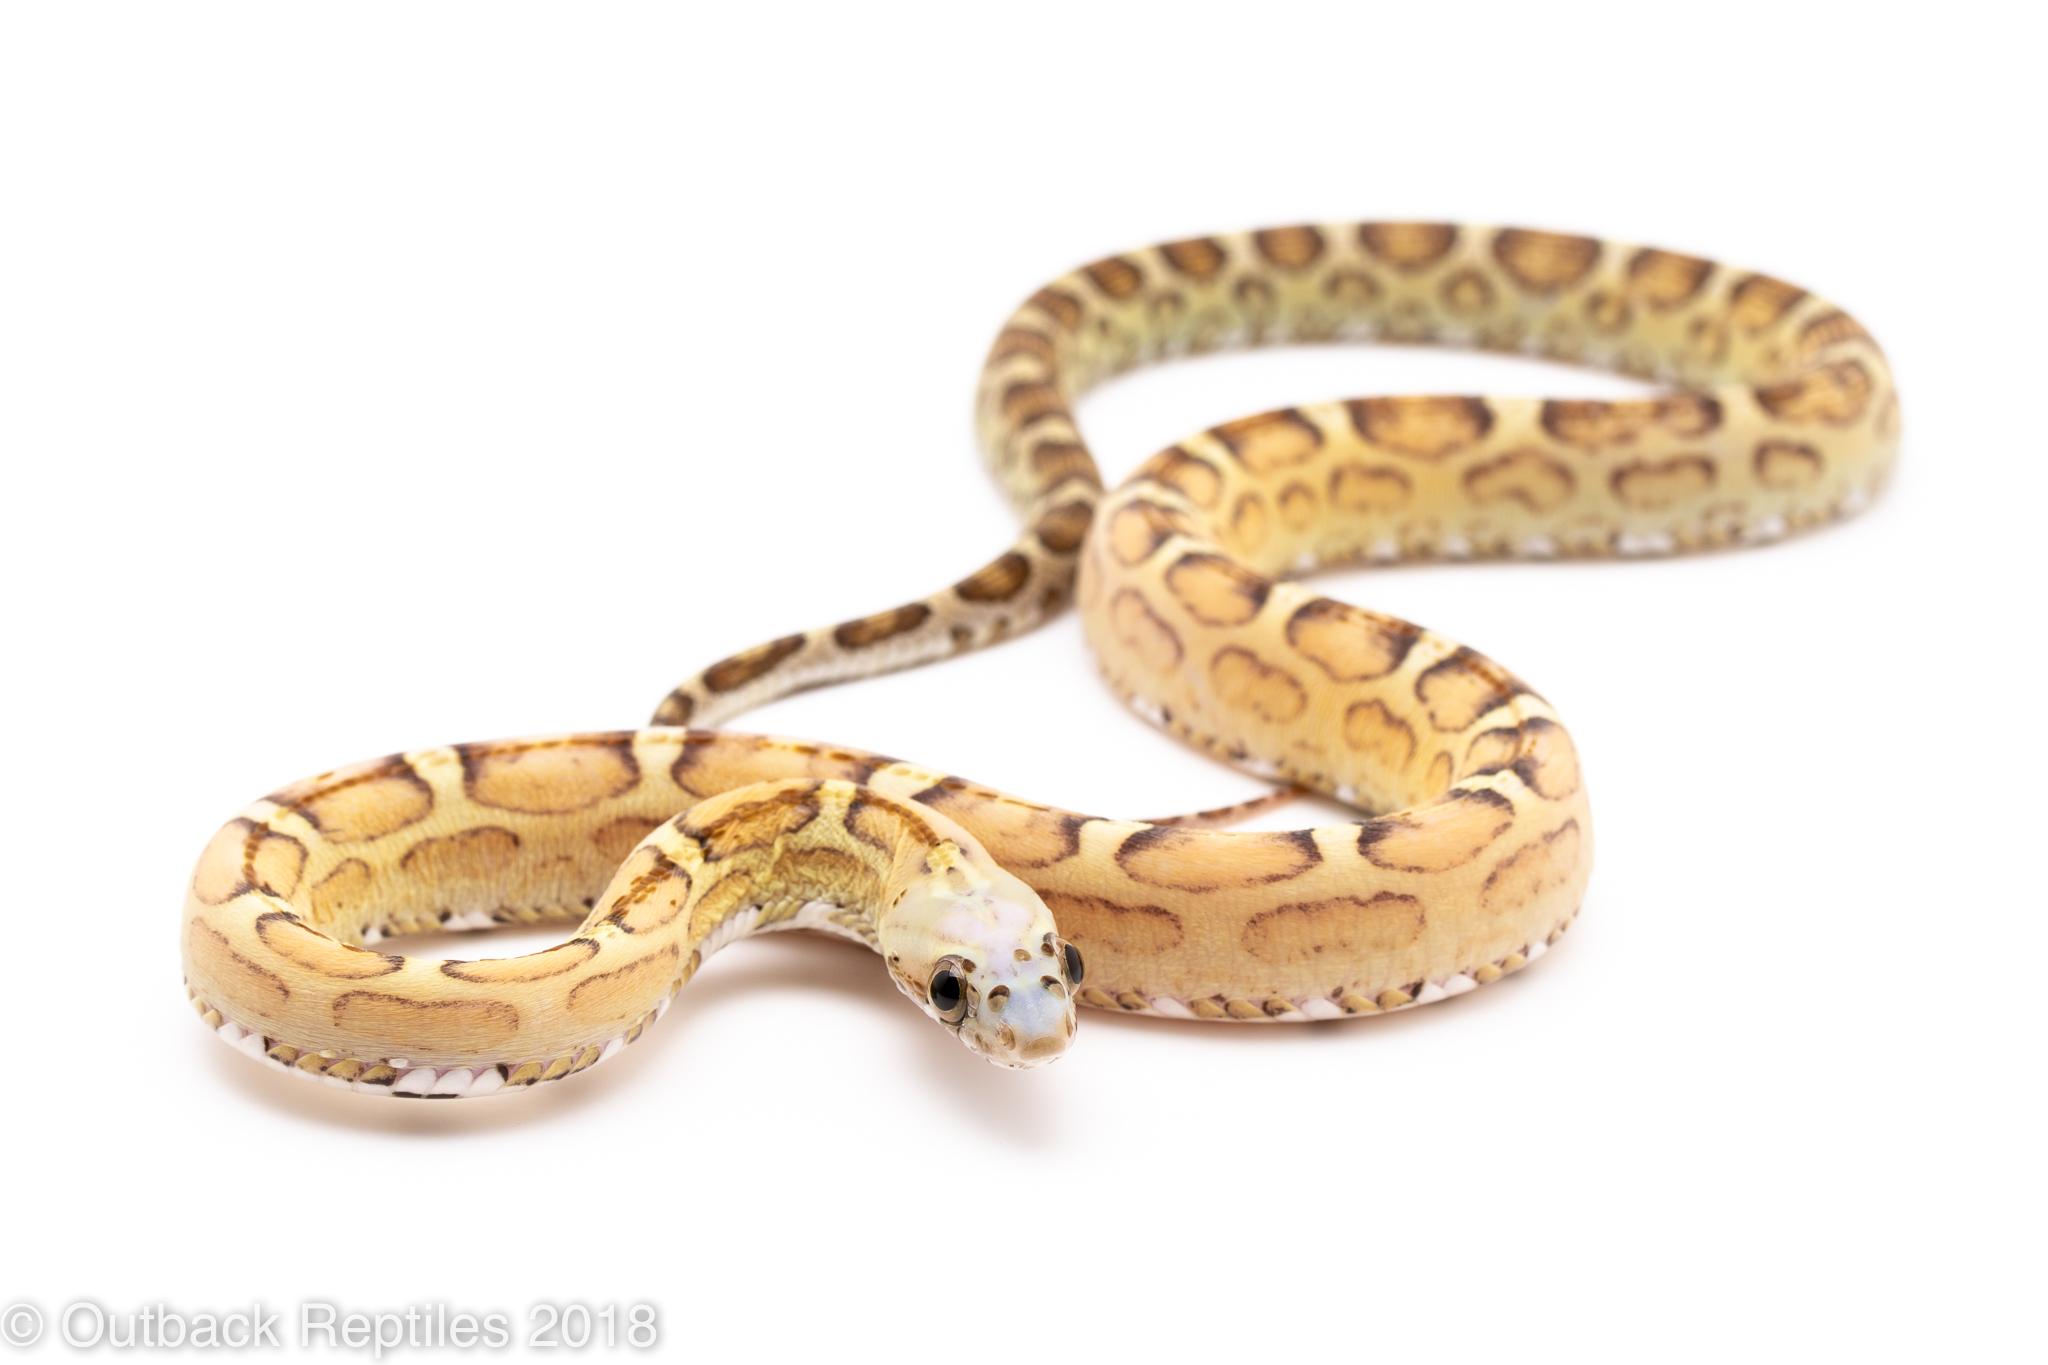 scaleless corn snake